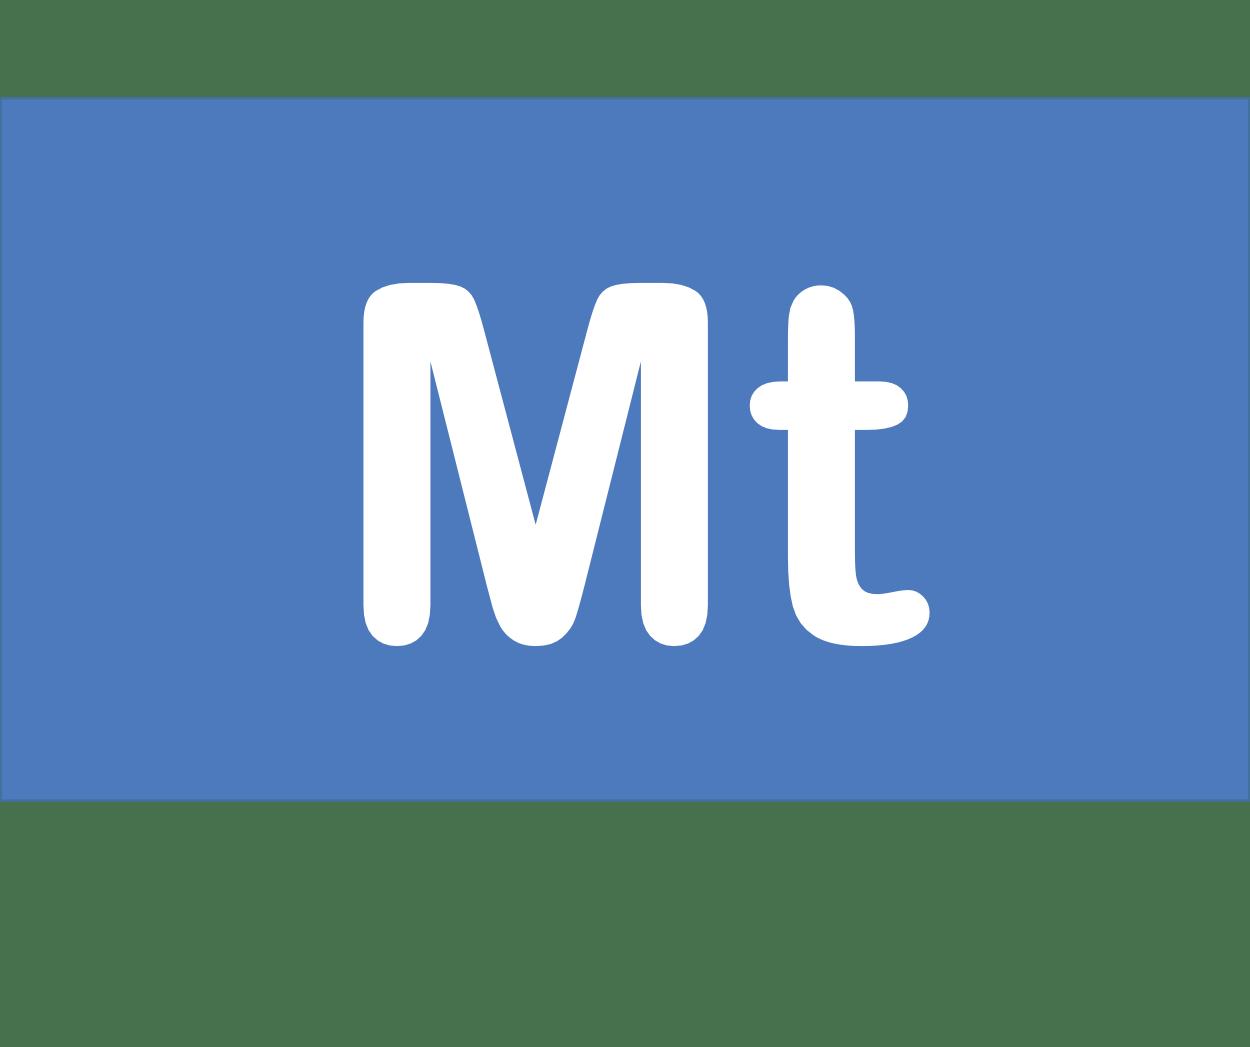 109 Mt マイトネリウム Meitnerium 元素 記号 周期表 化学 原子